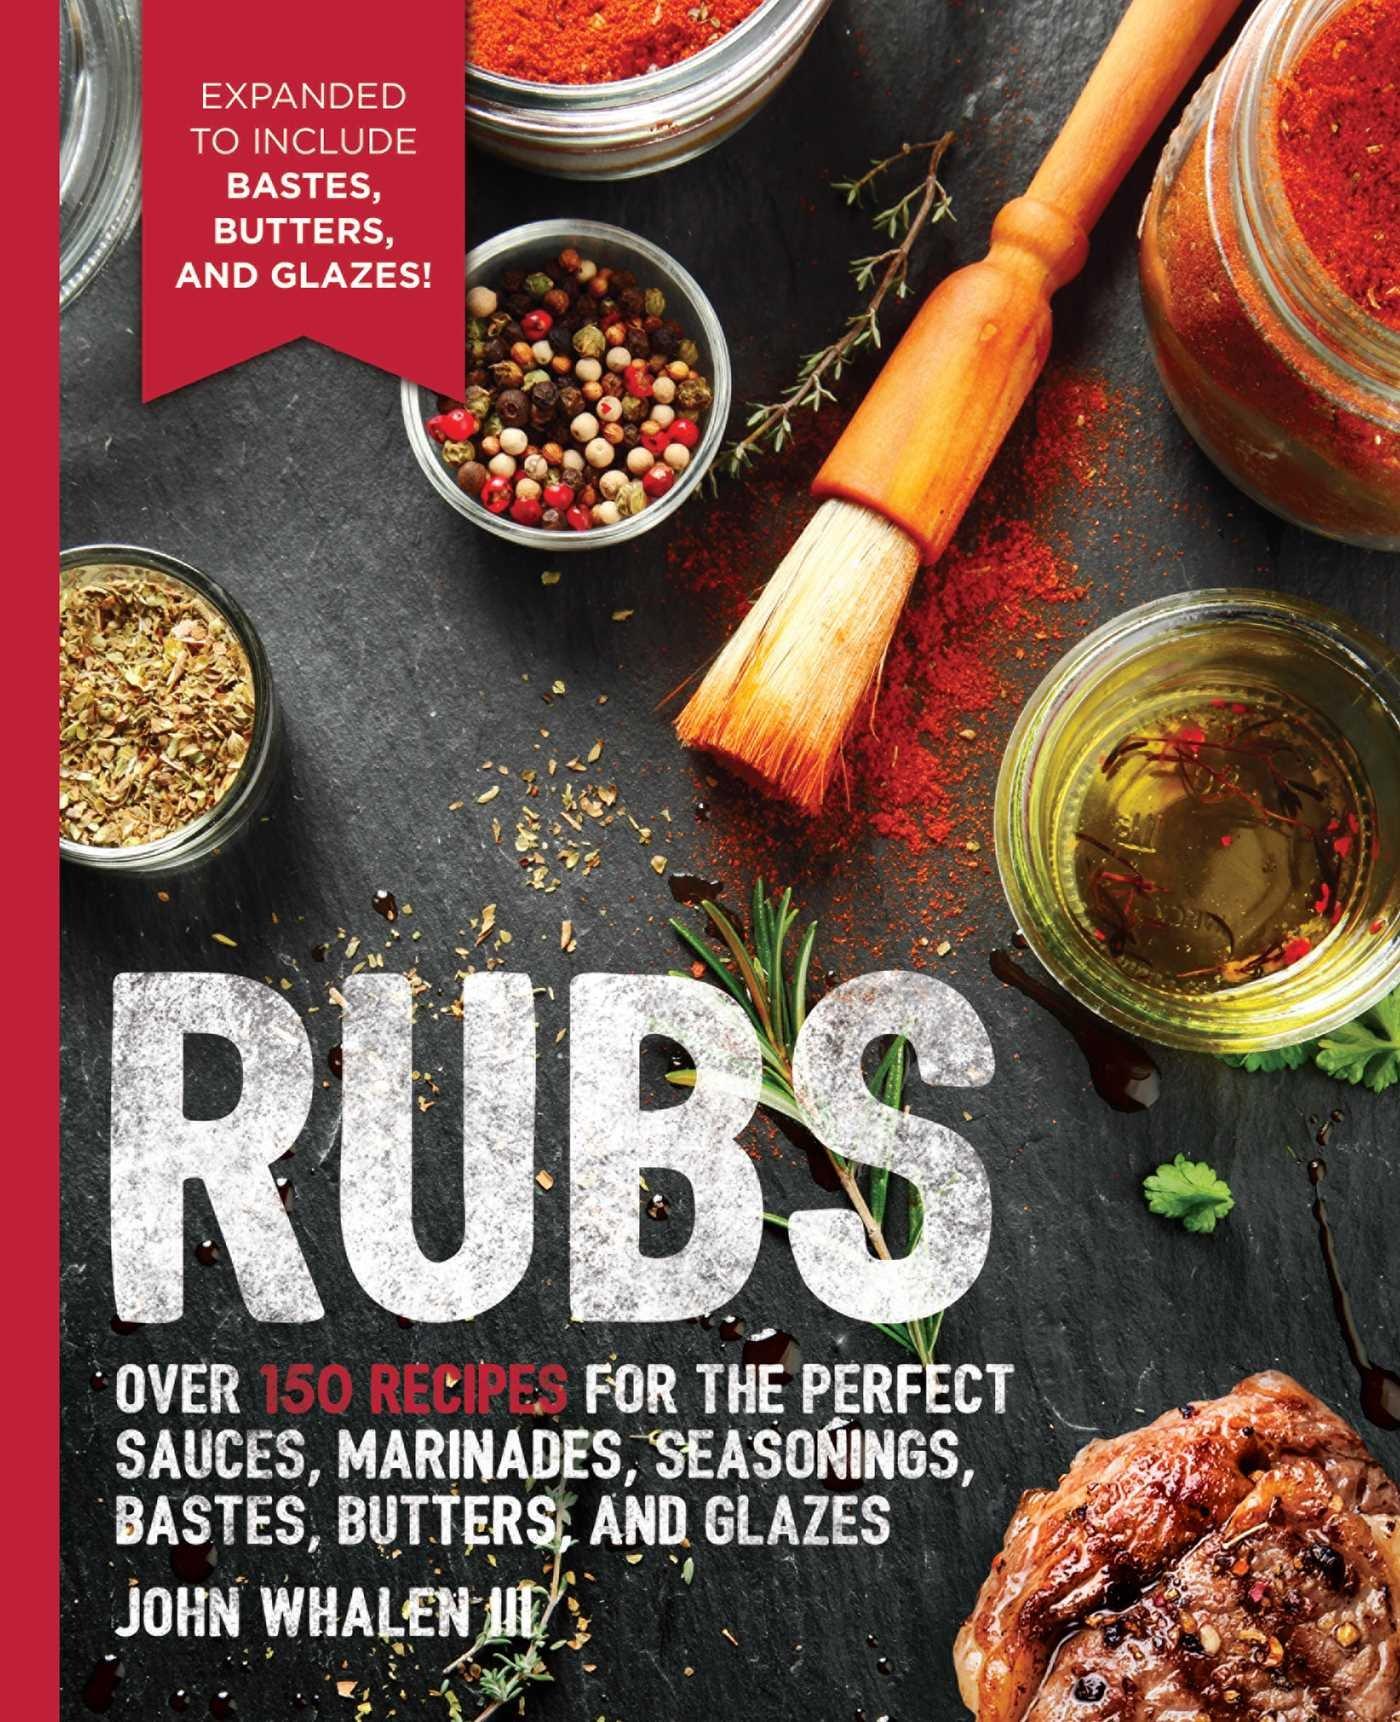 Rubs recipes marinades seasonings Entertaining